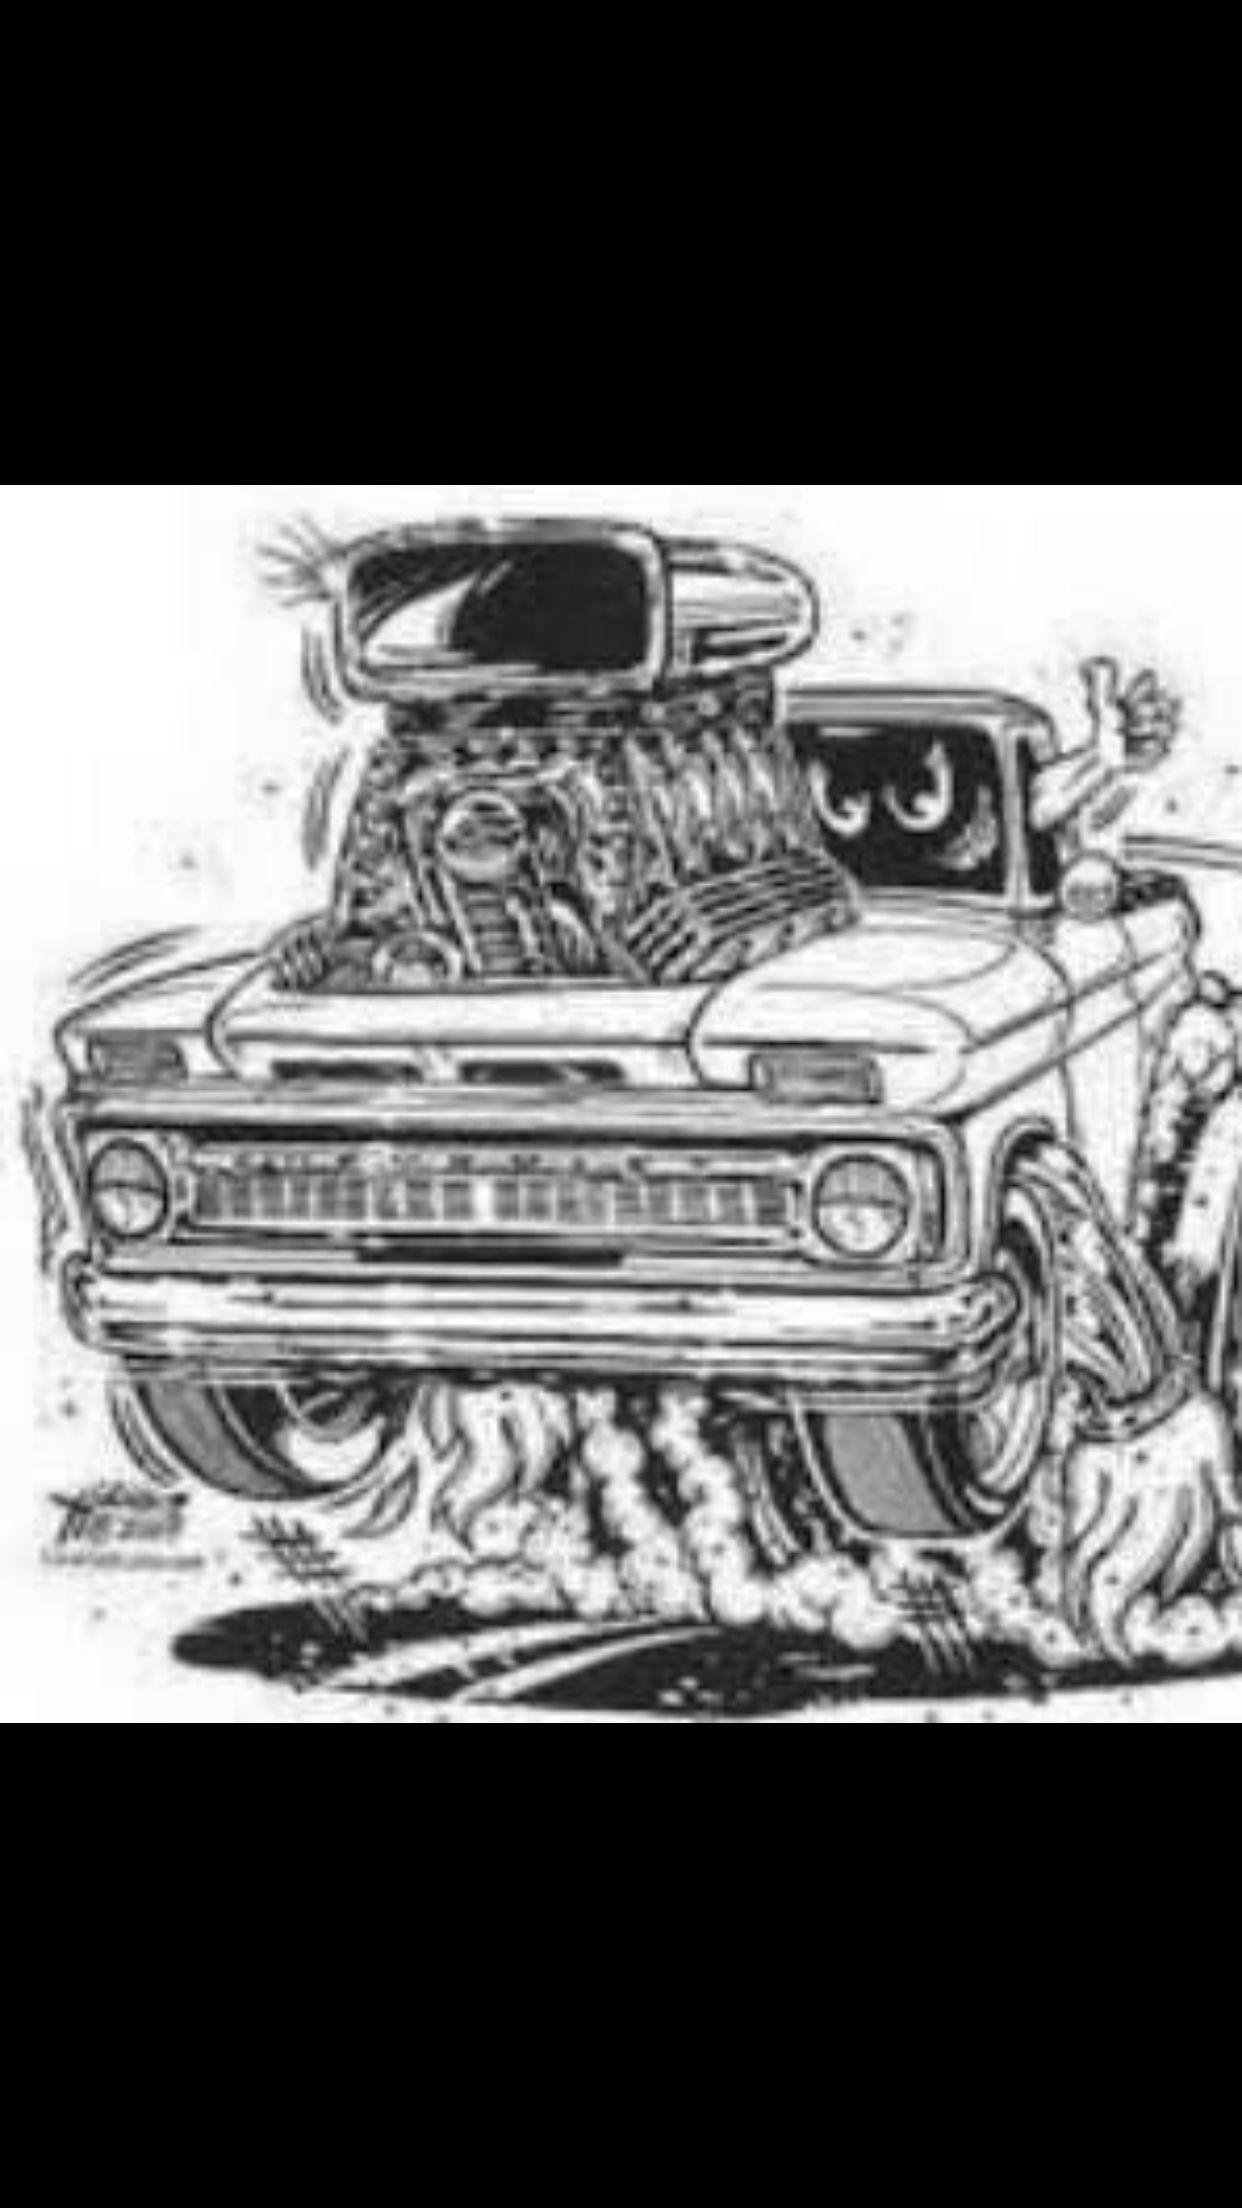 Pin de Joe Bruce en 64 Chevy truck ideas | Pinterest